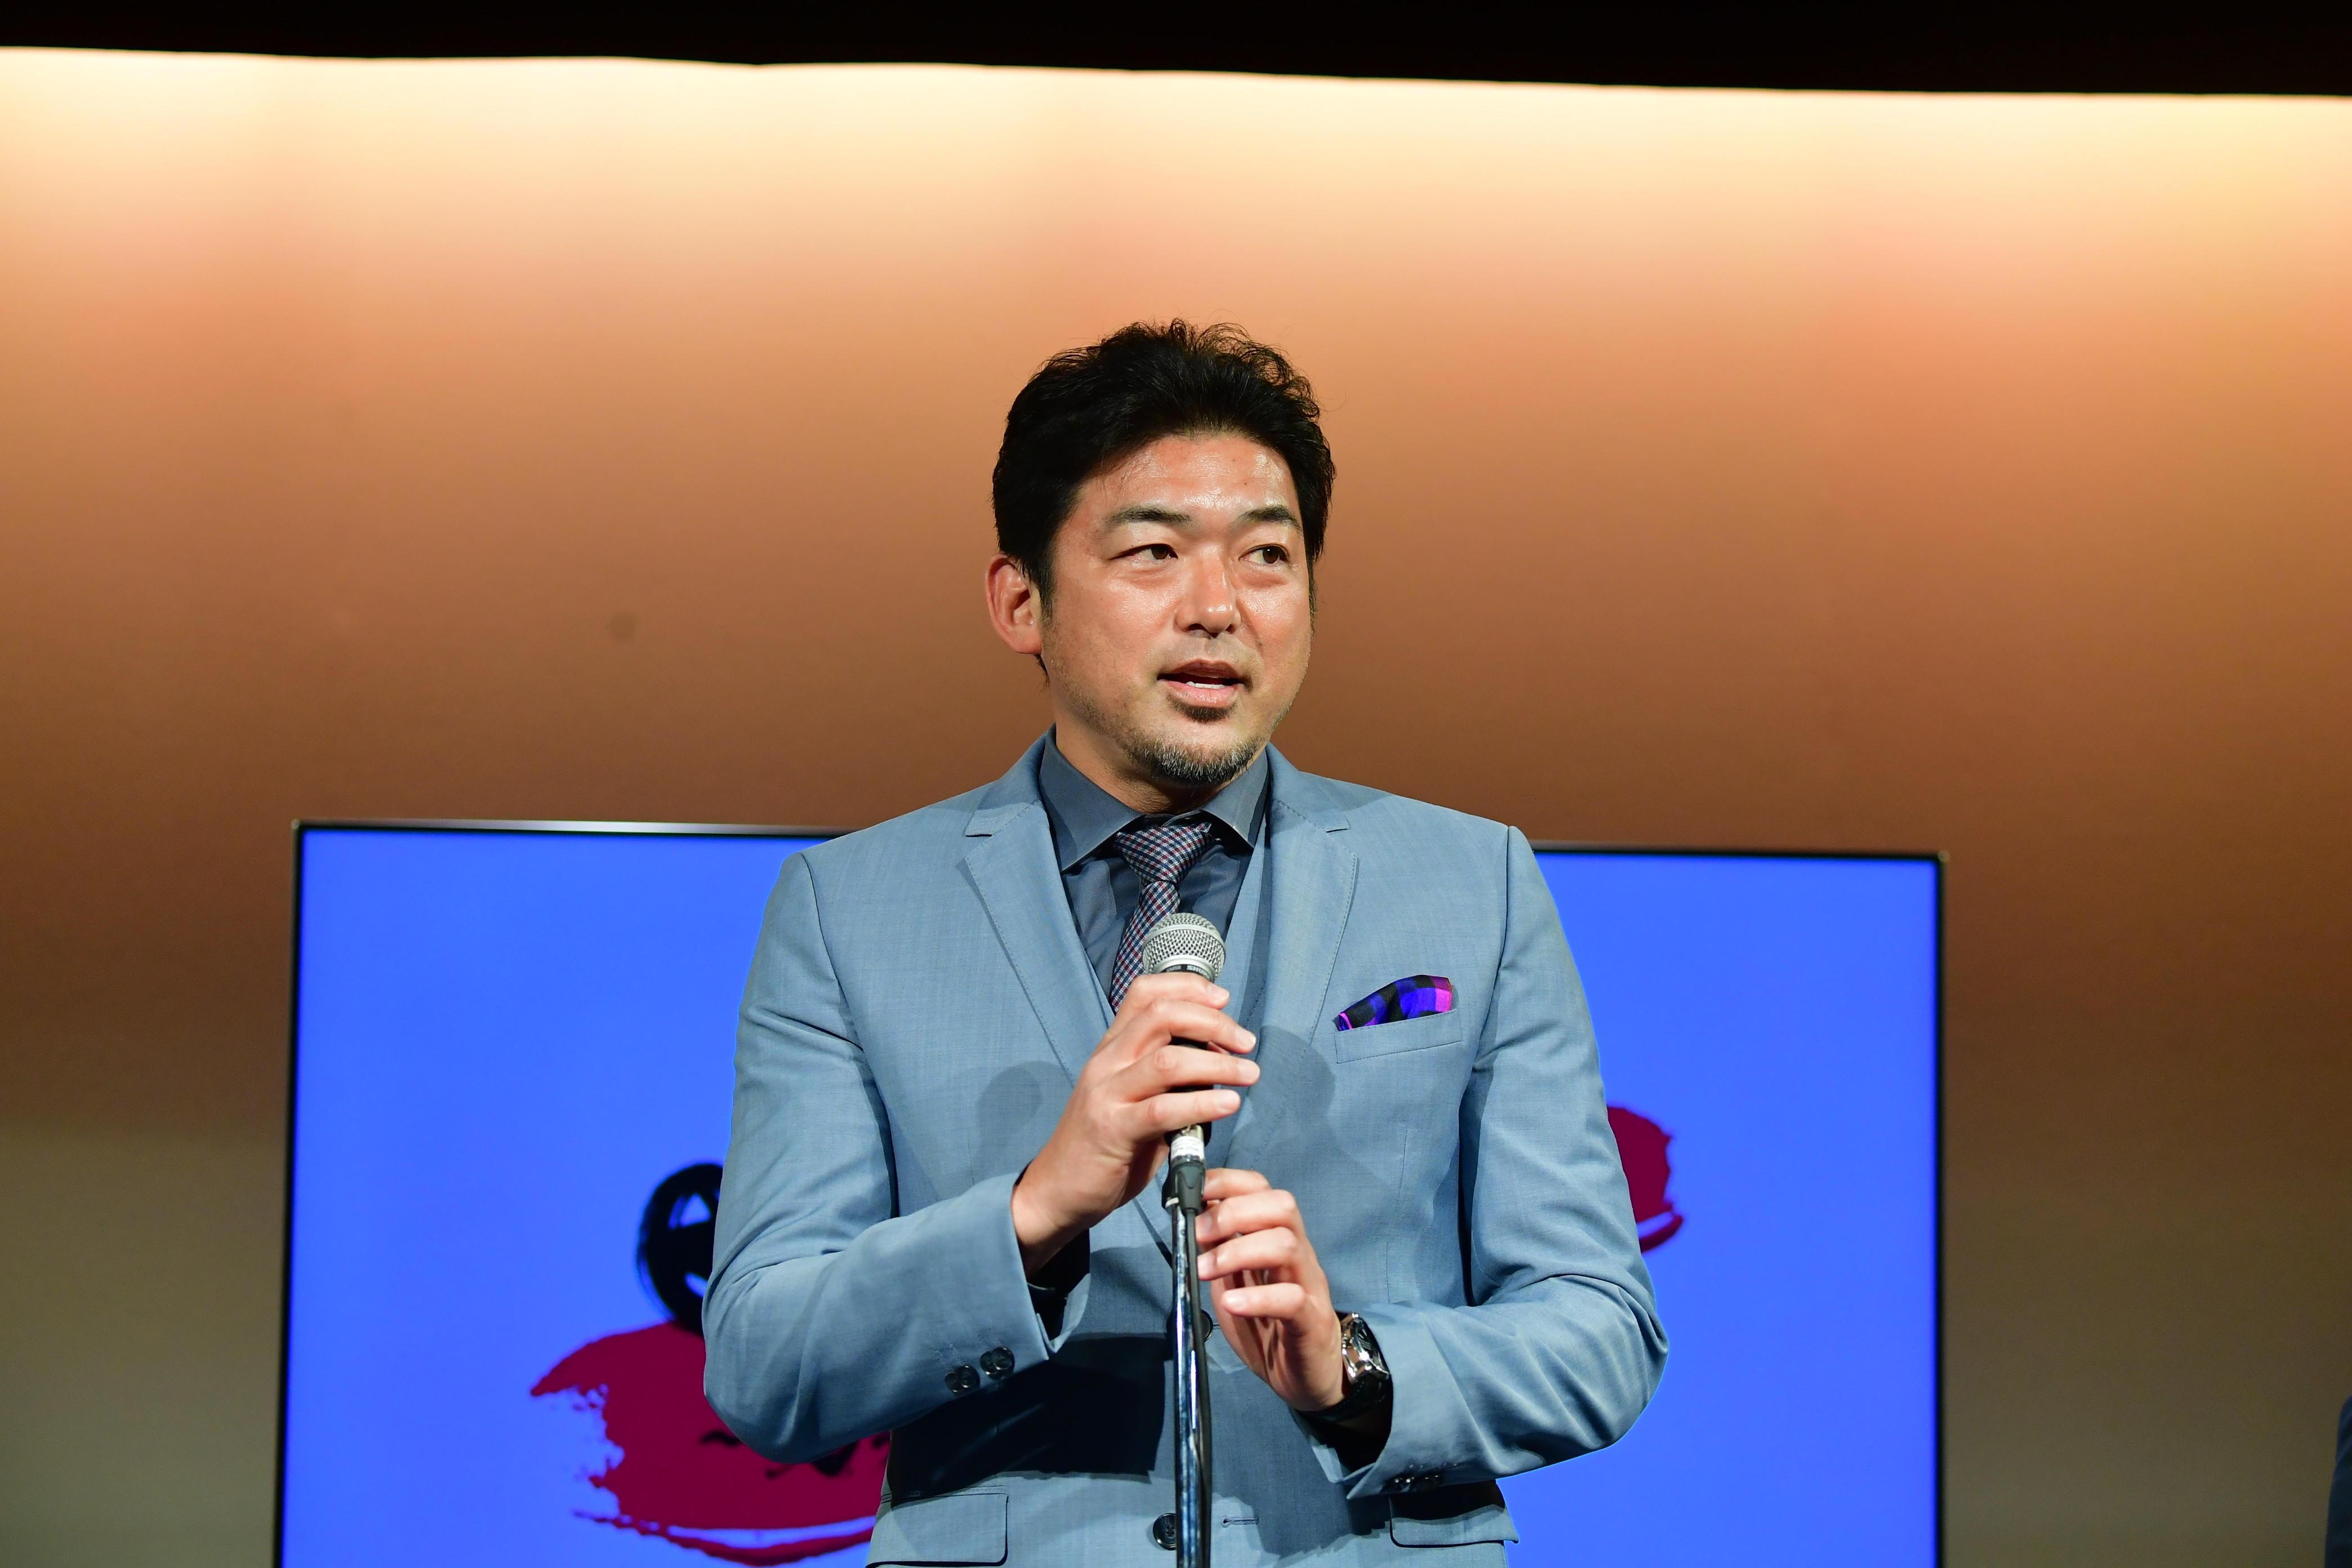 http://news.yoshimoto.co.jp/20181206203258-85078c9dff7b3456485edead40e15aee1493e112.jpg